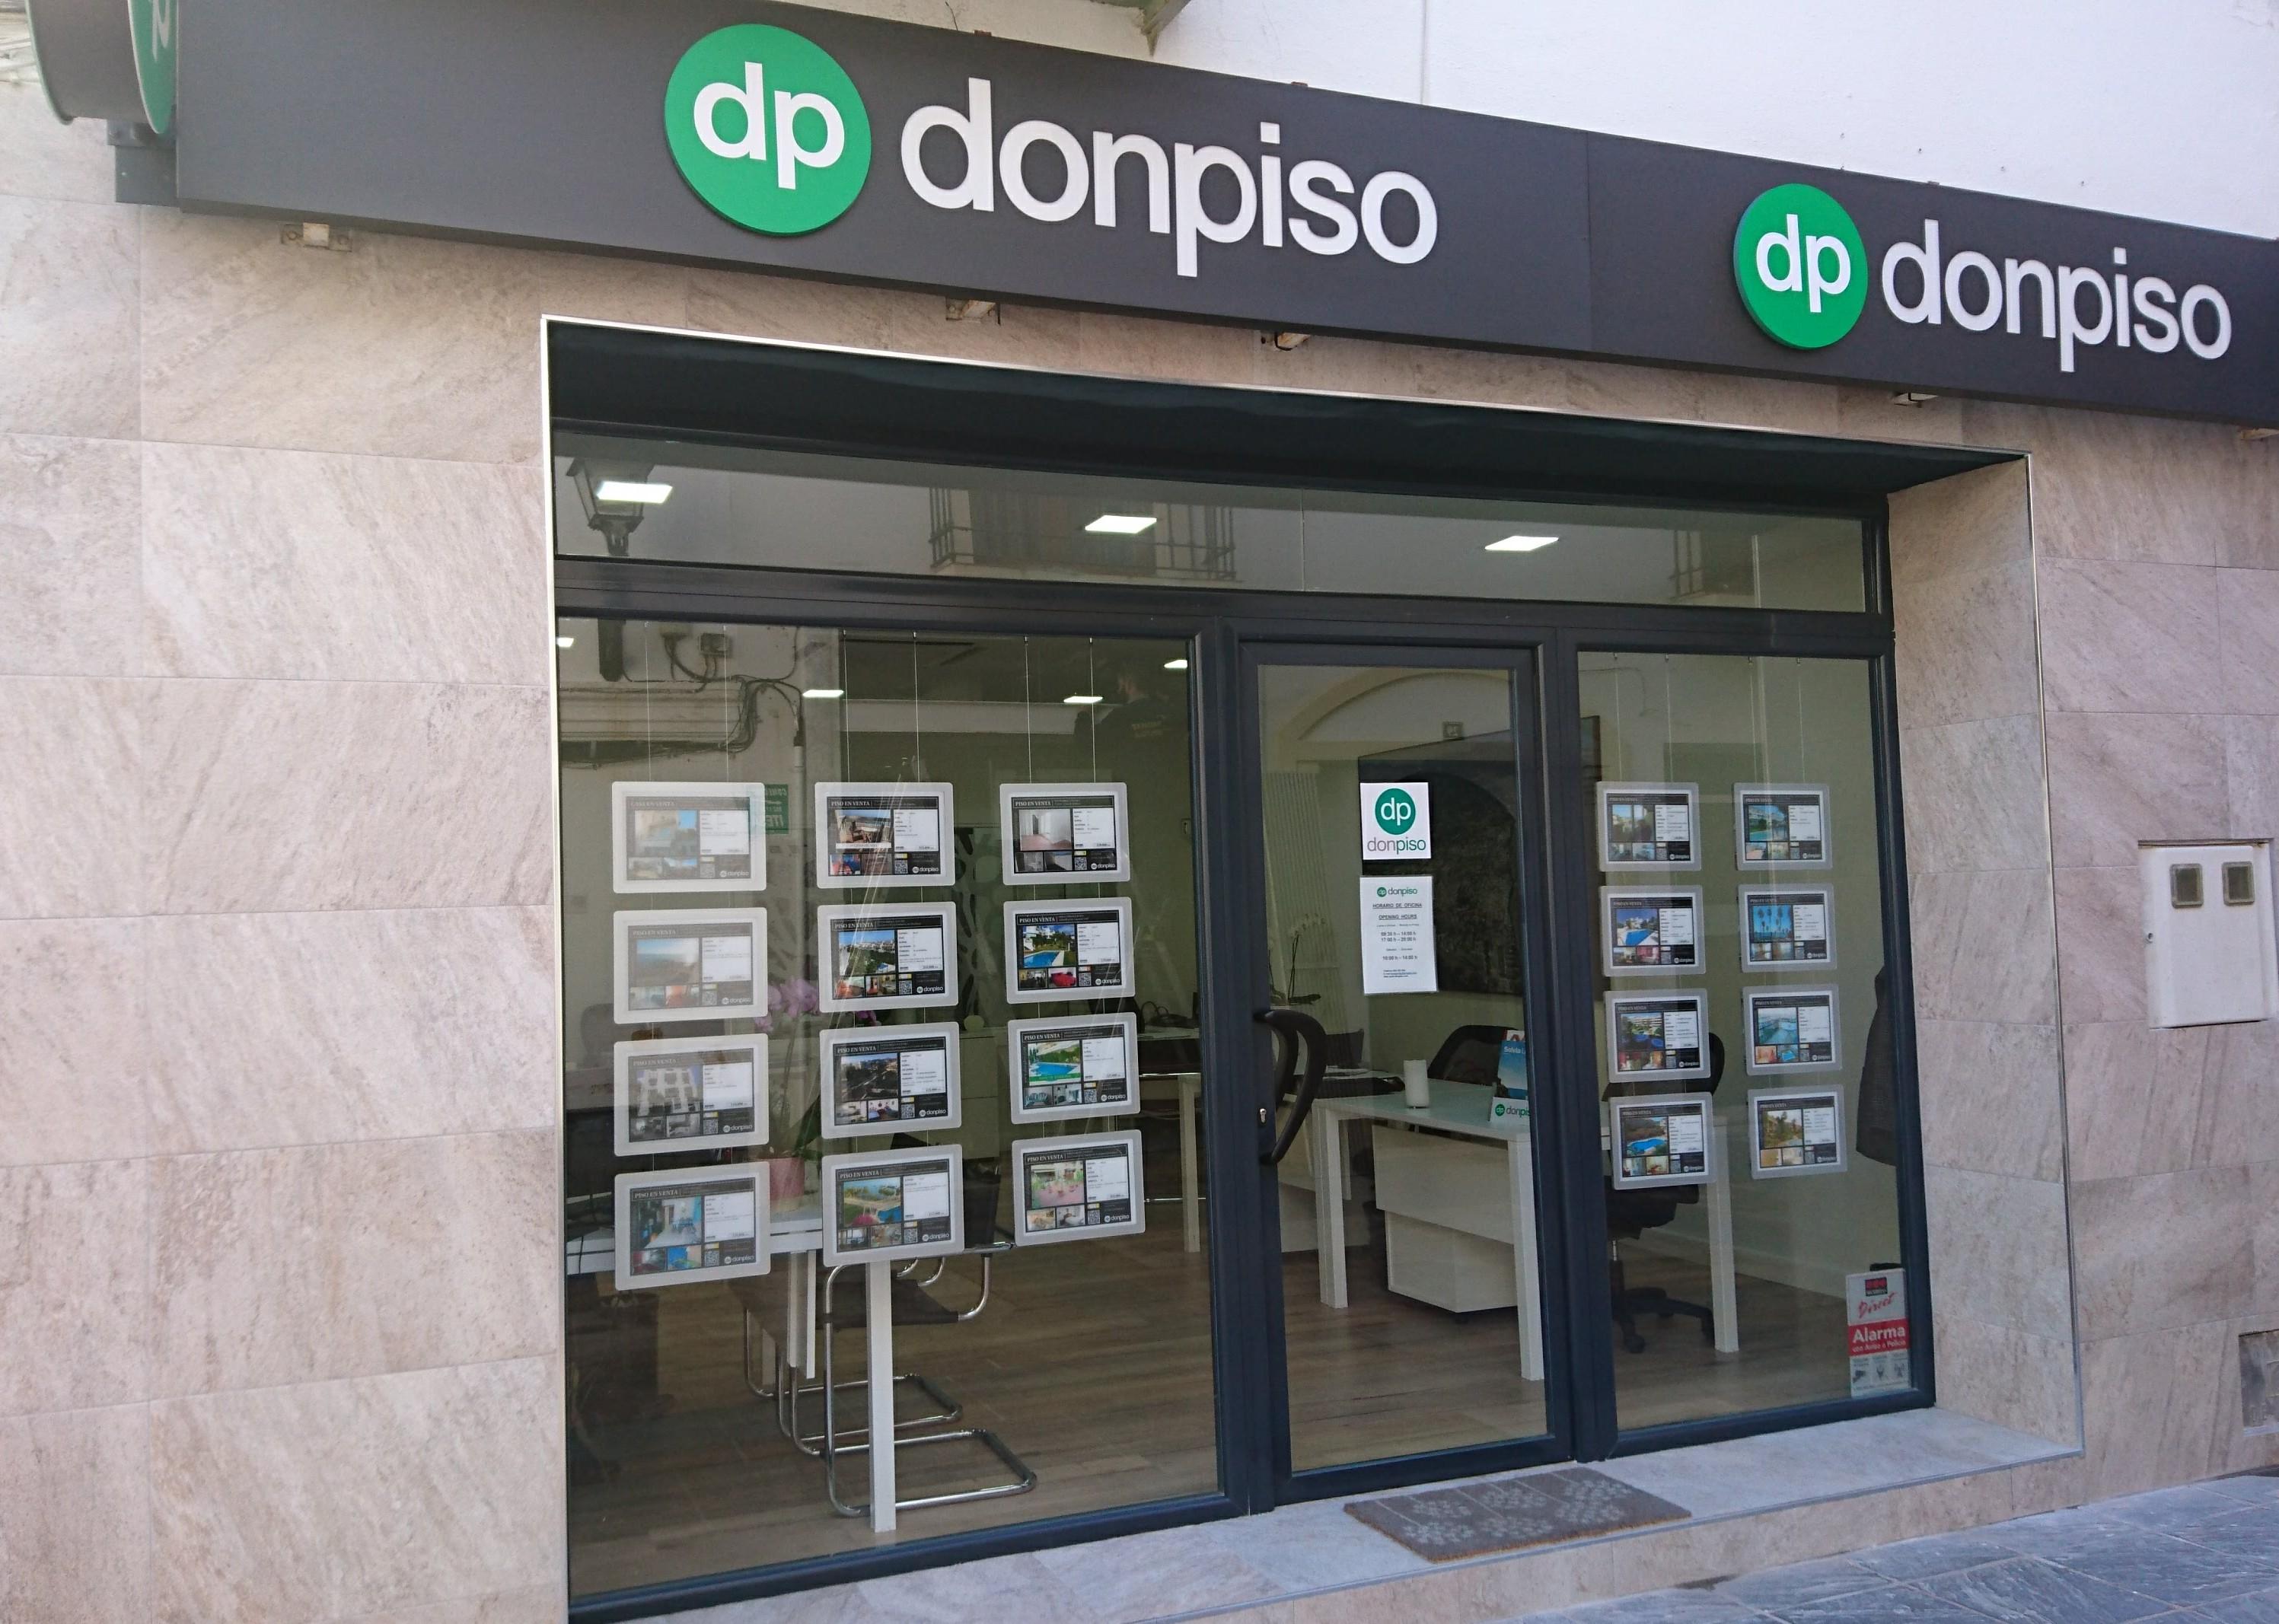 oficina donpiso Fuengirola Centro